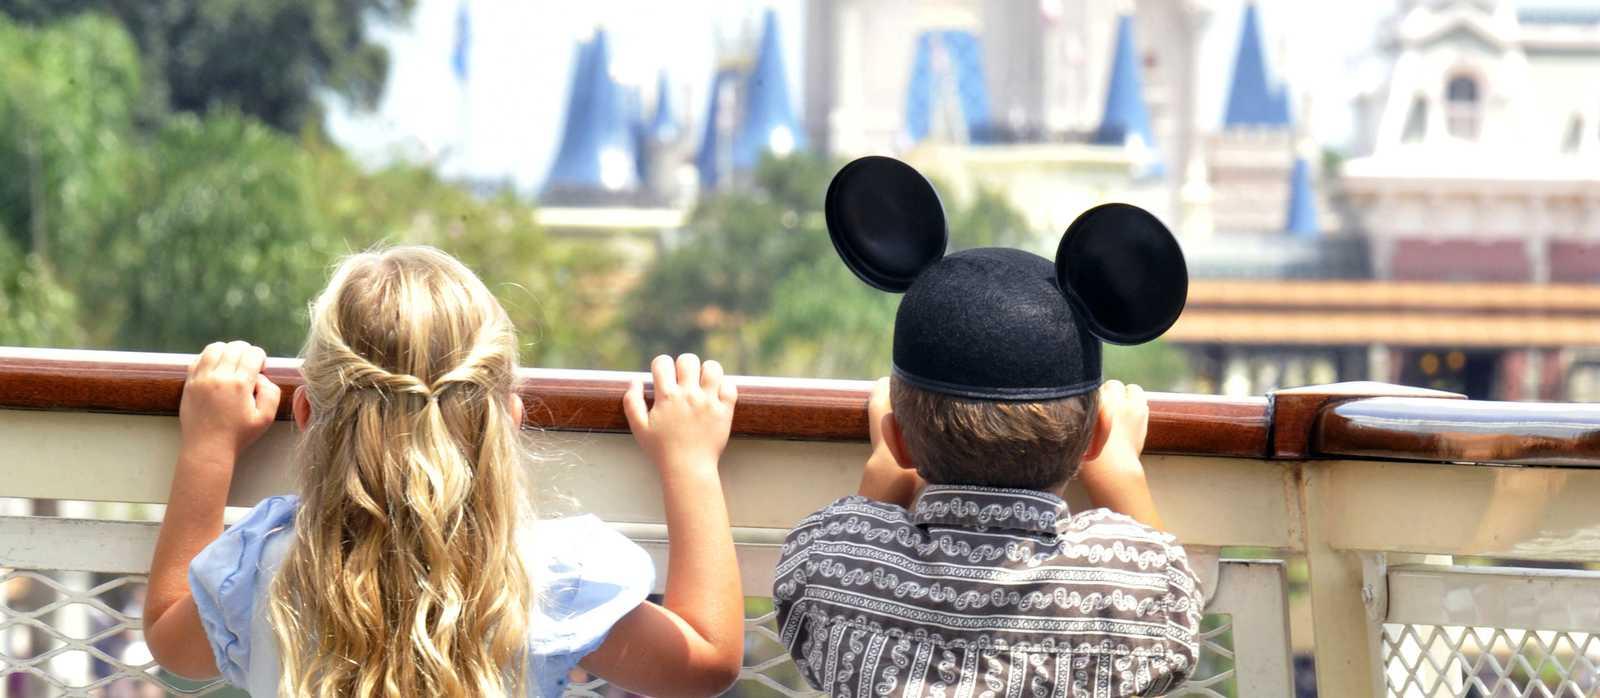 Siblings, Magic Kingdom, Orlando